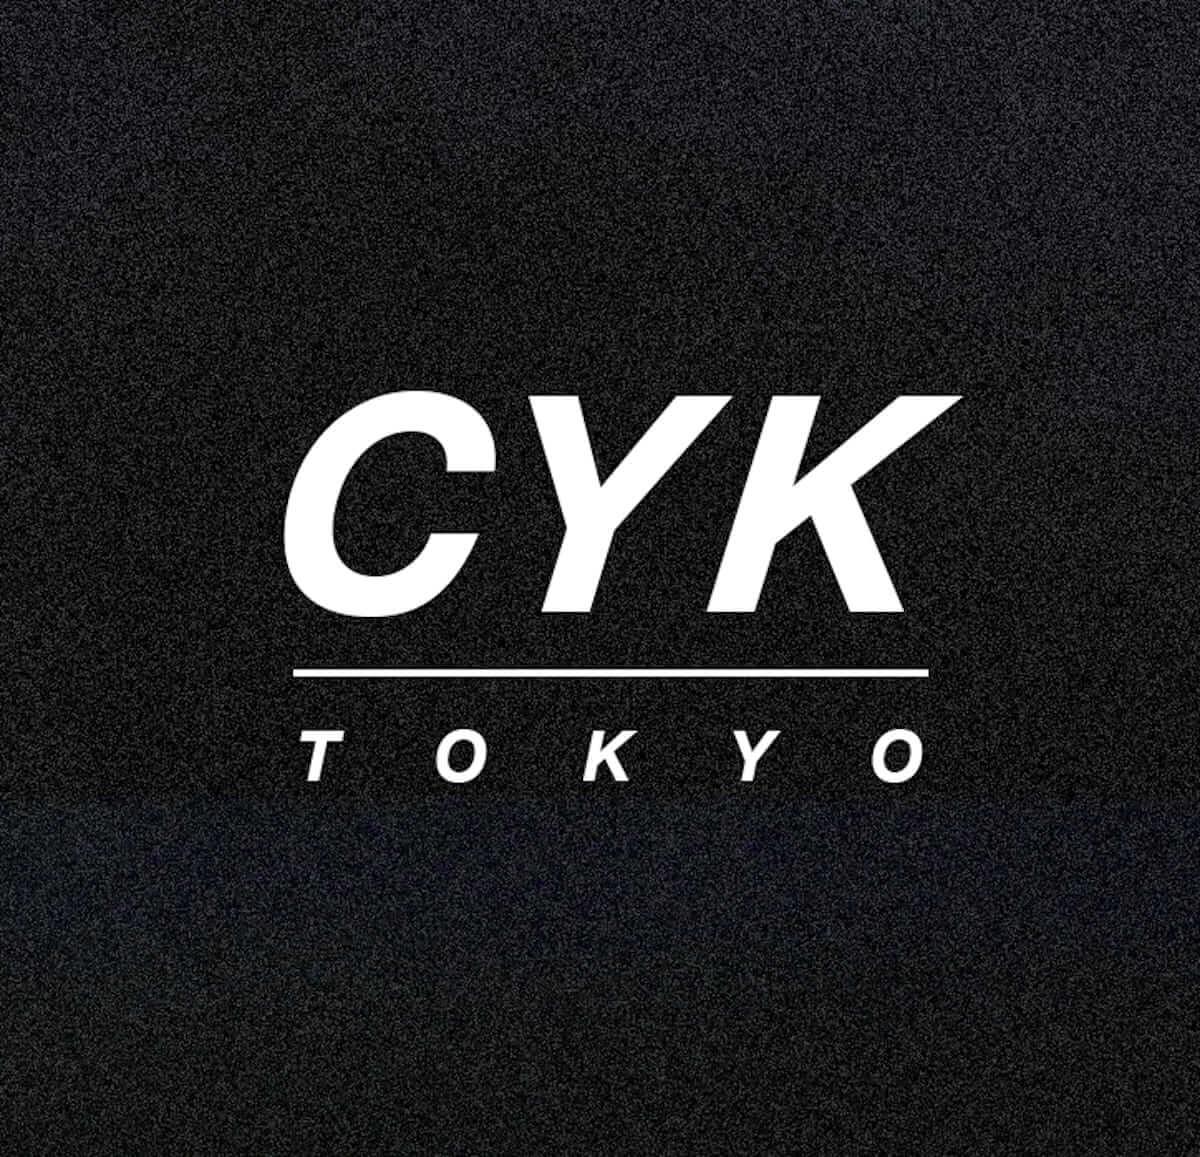 CYK Crewがエントランス・フリーのB2B All Night Long Set Partyを8月に開催 music180704_cyk-tokyo_2-1200x1157